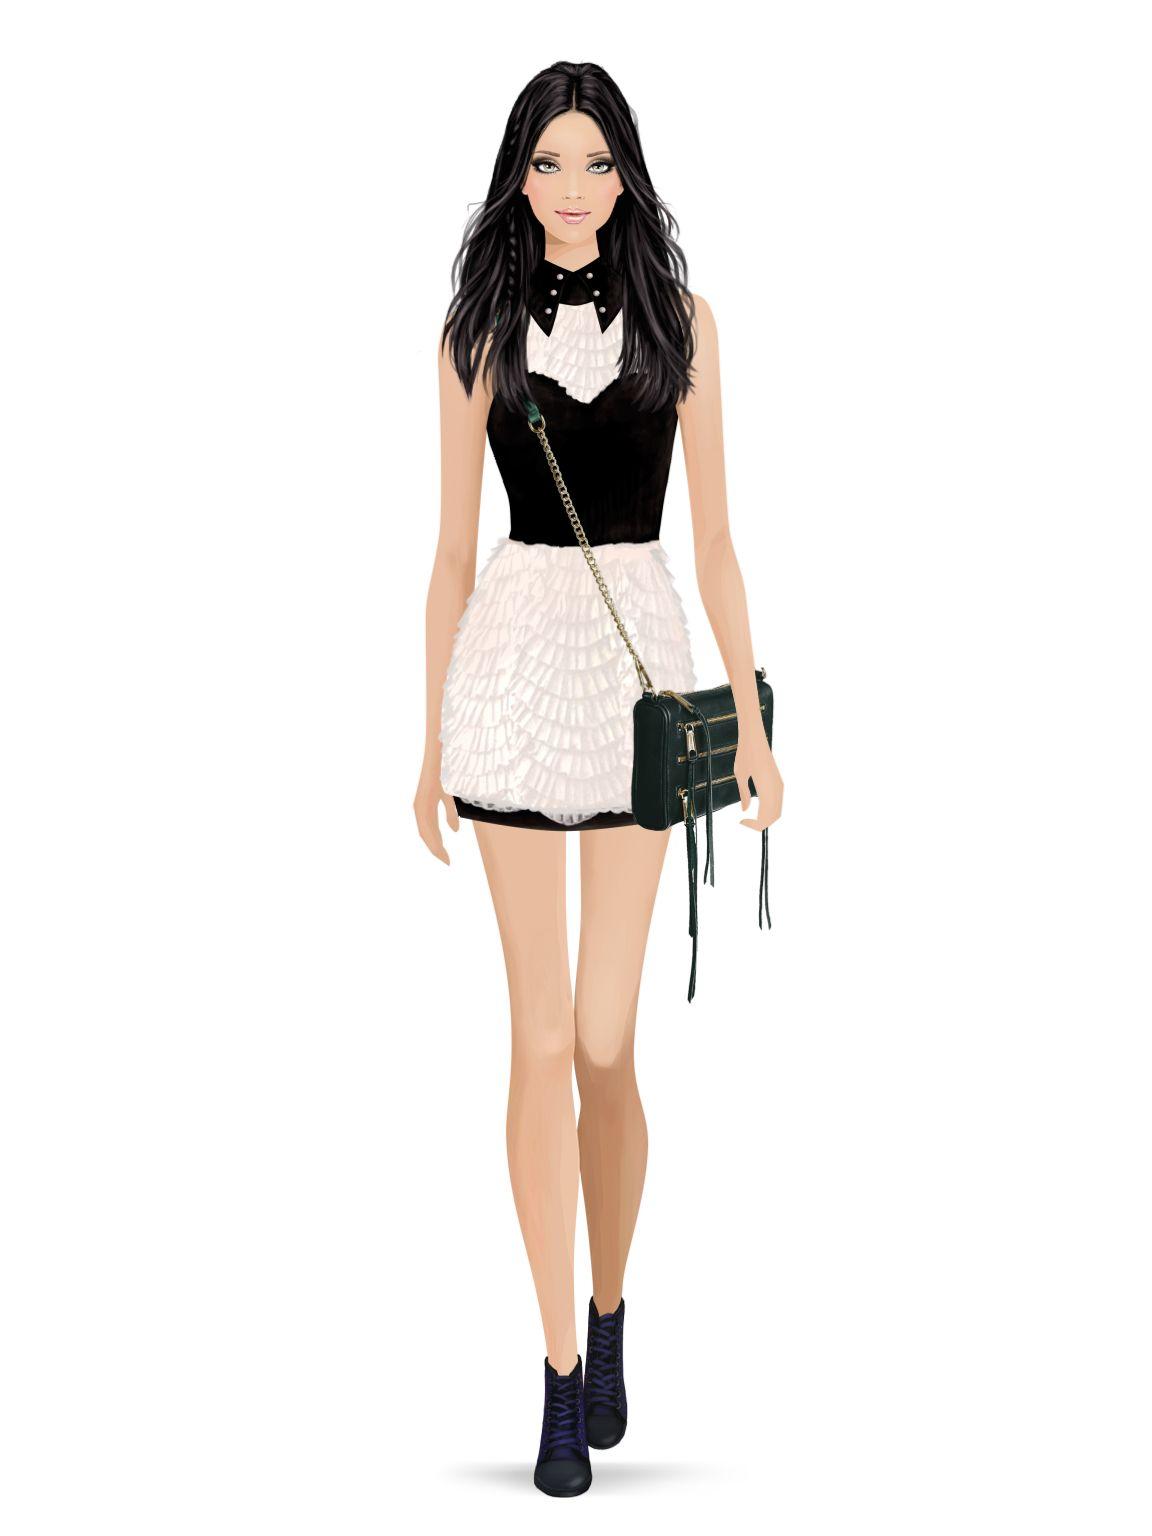 Fashion game fashion game looks pinterest fashion games